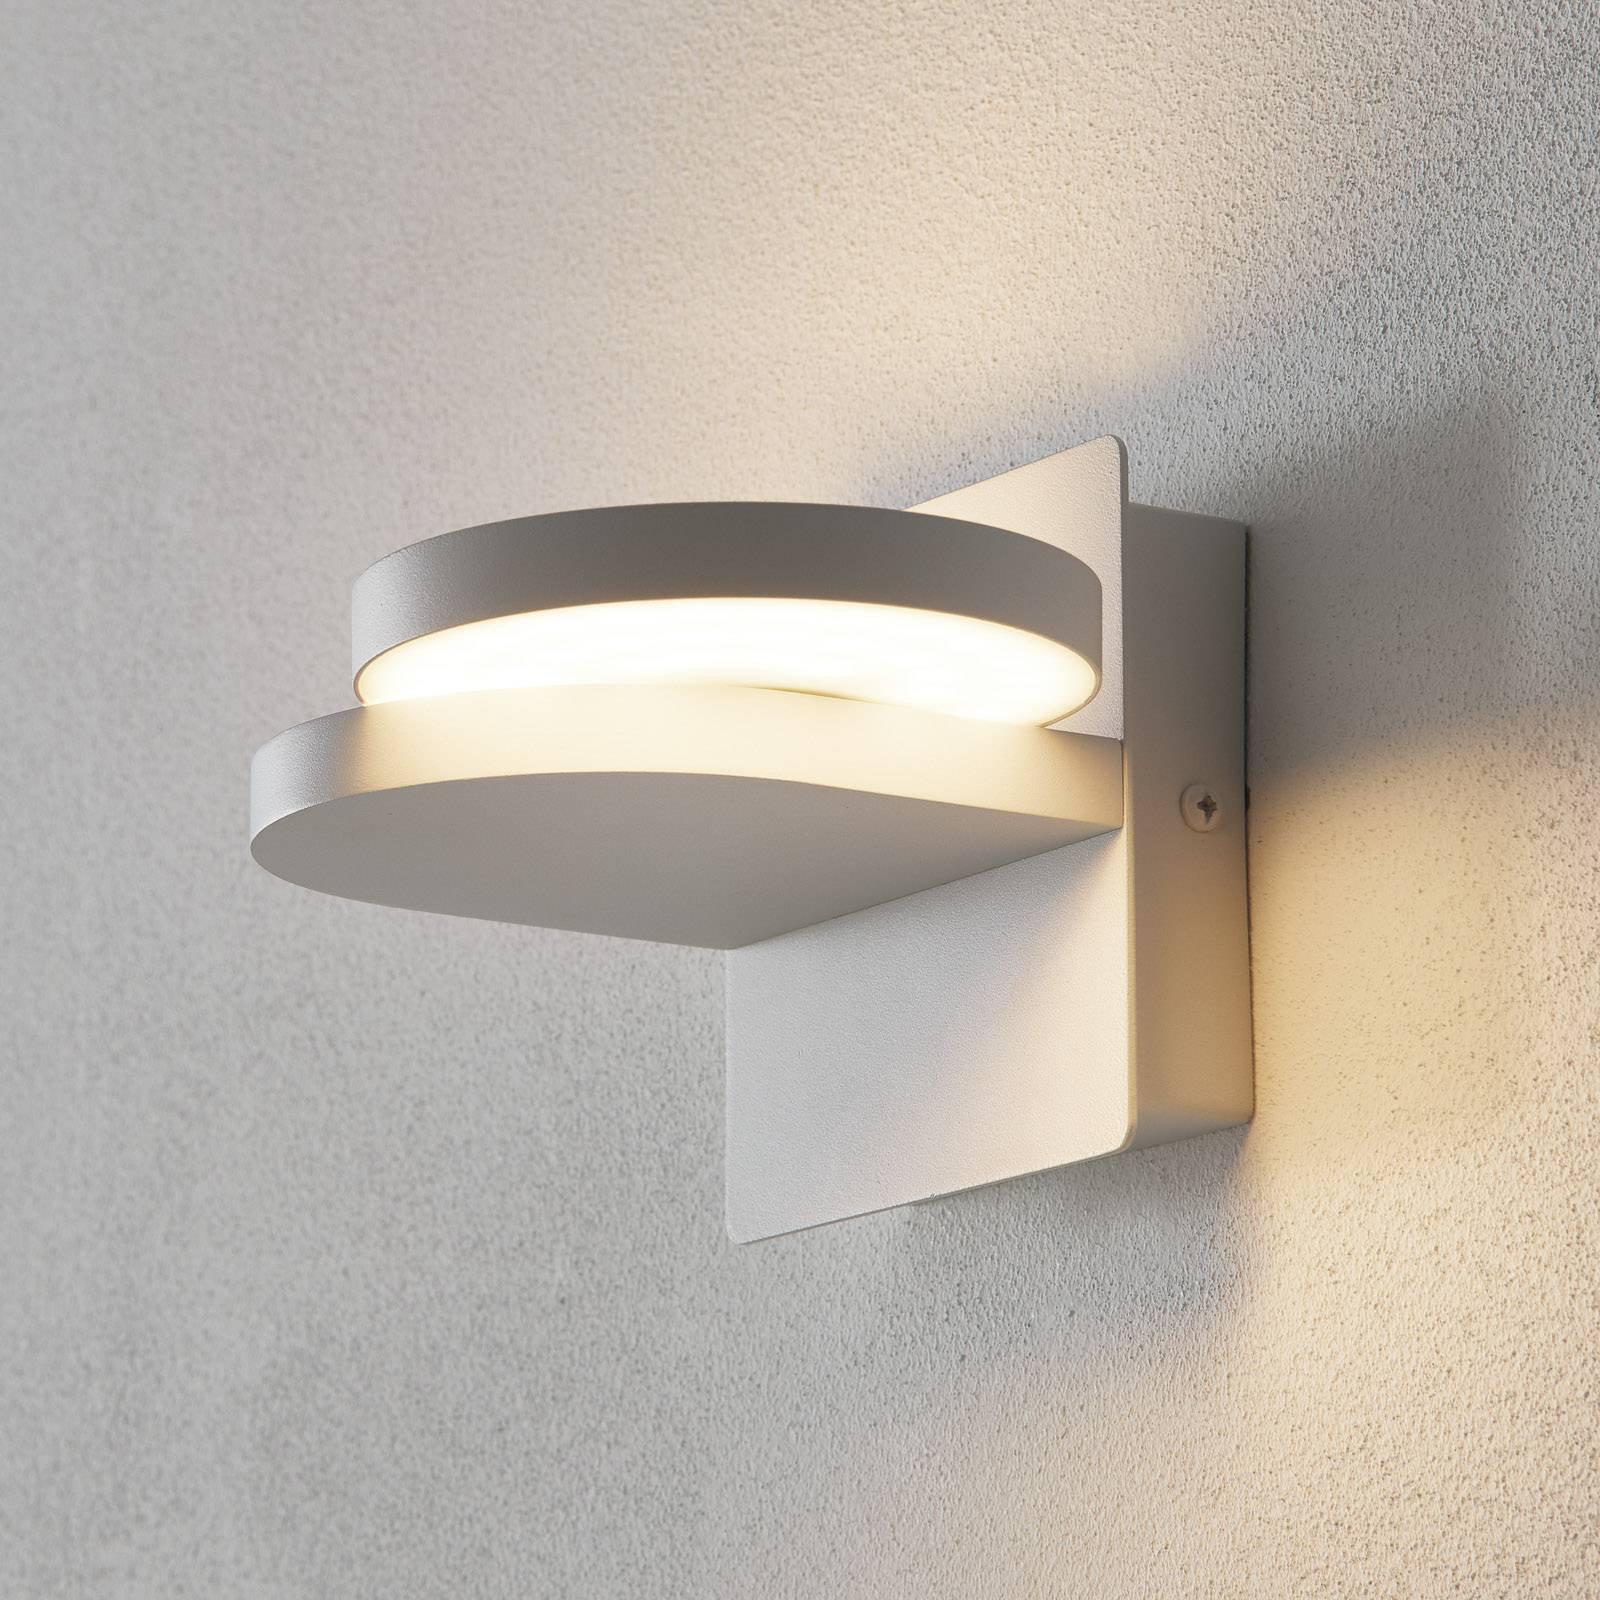 Dreibar LED-vegglampe Belo